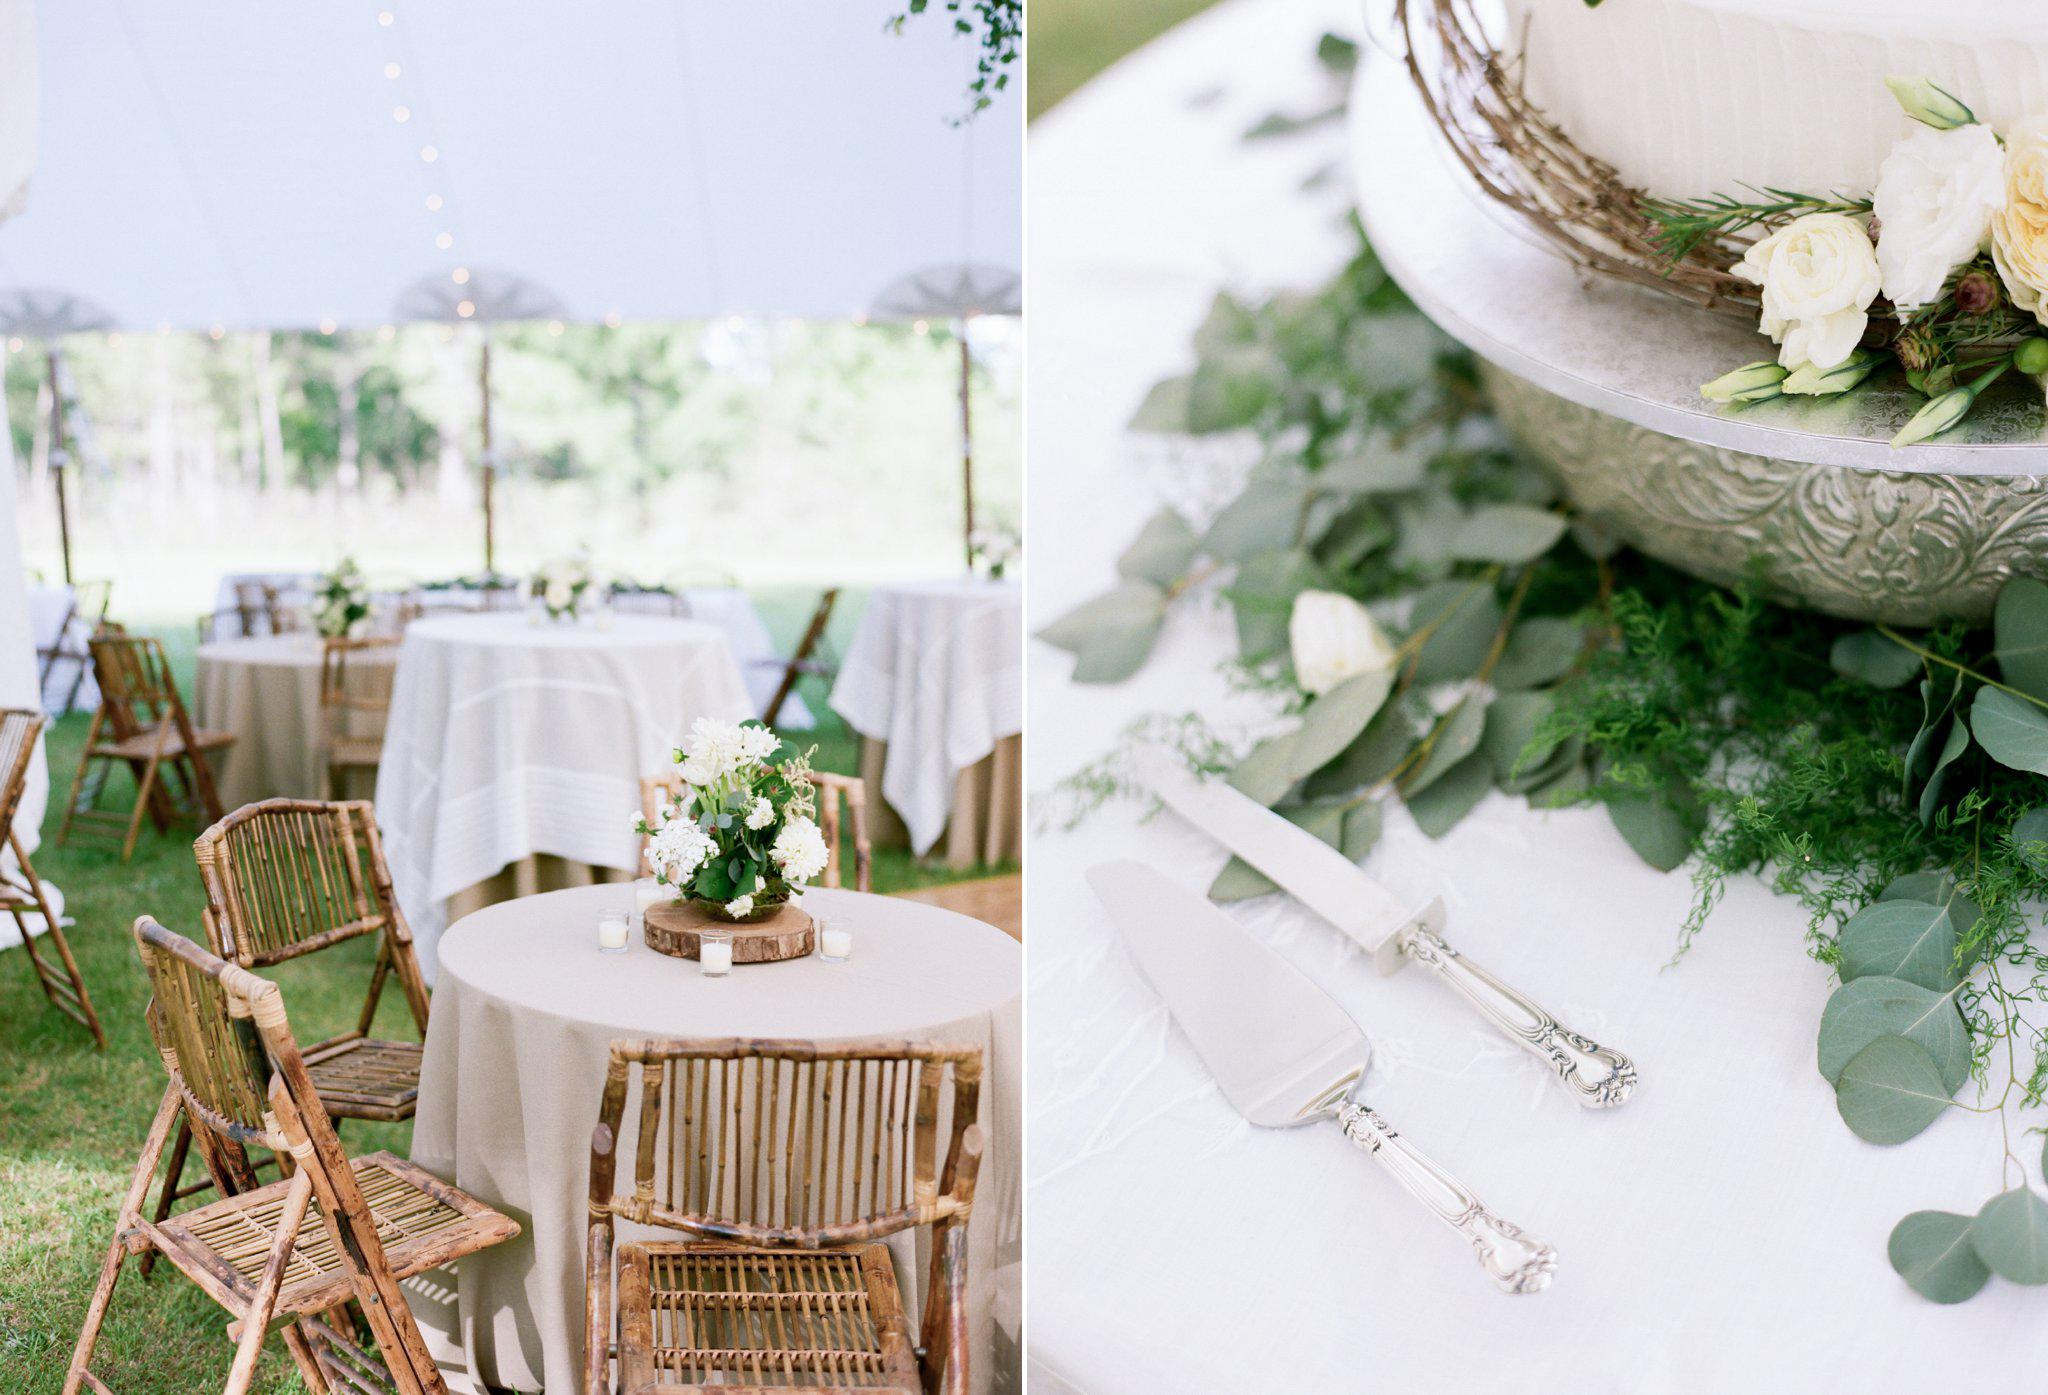 ecila farm wedding albany georgia wedding photographer shannon griffin photography-26.jpg